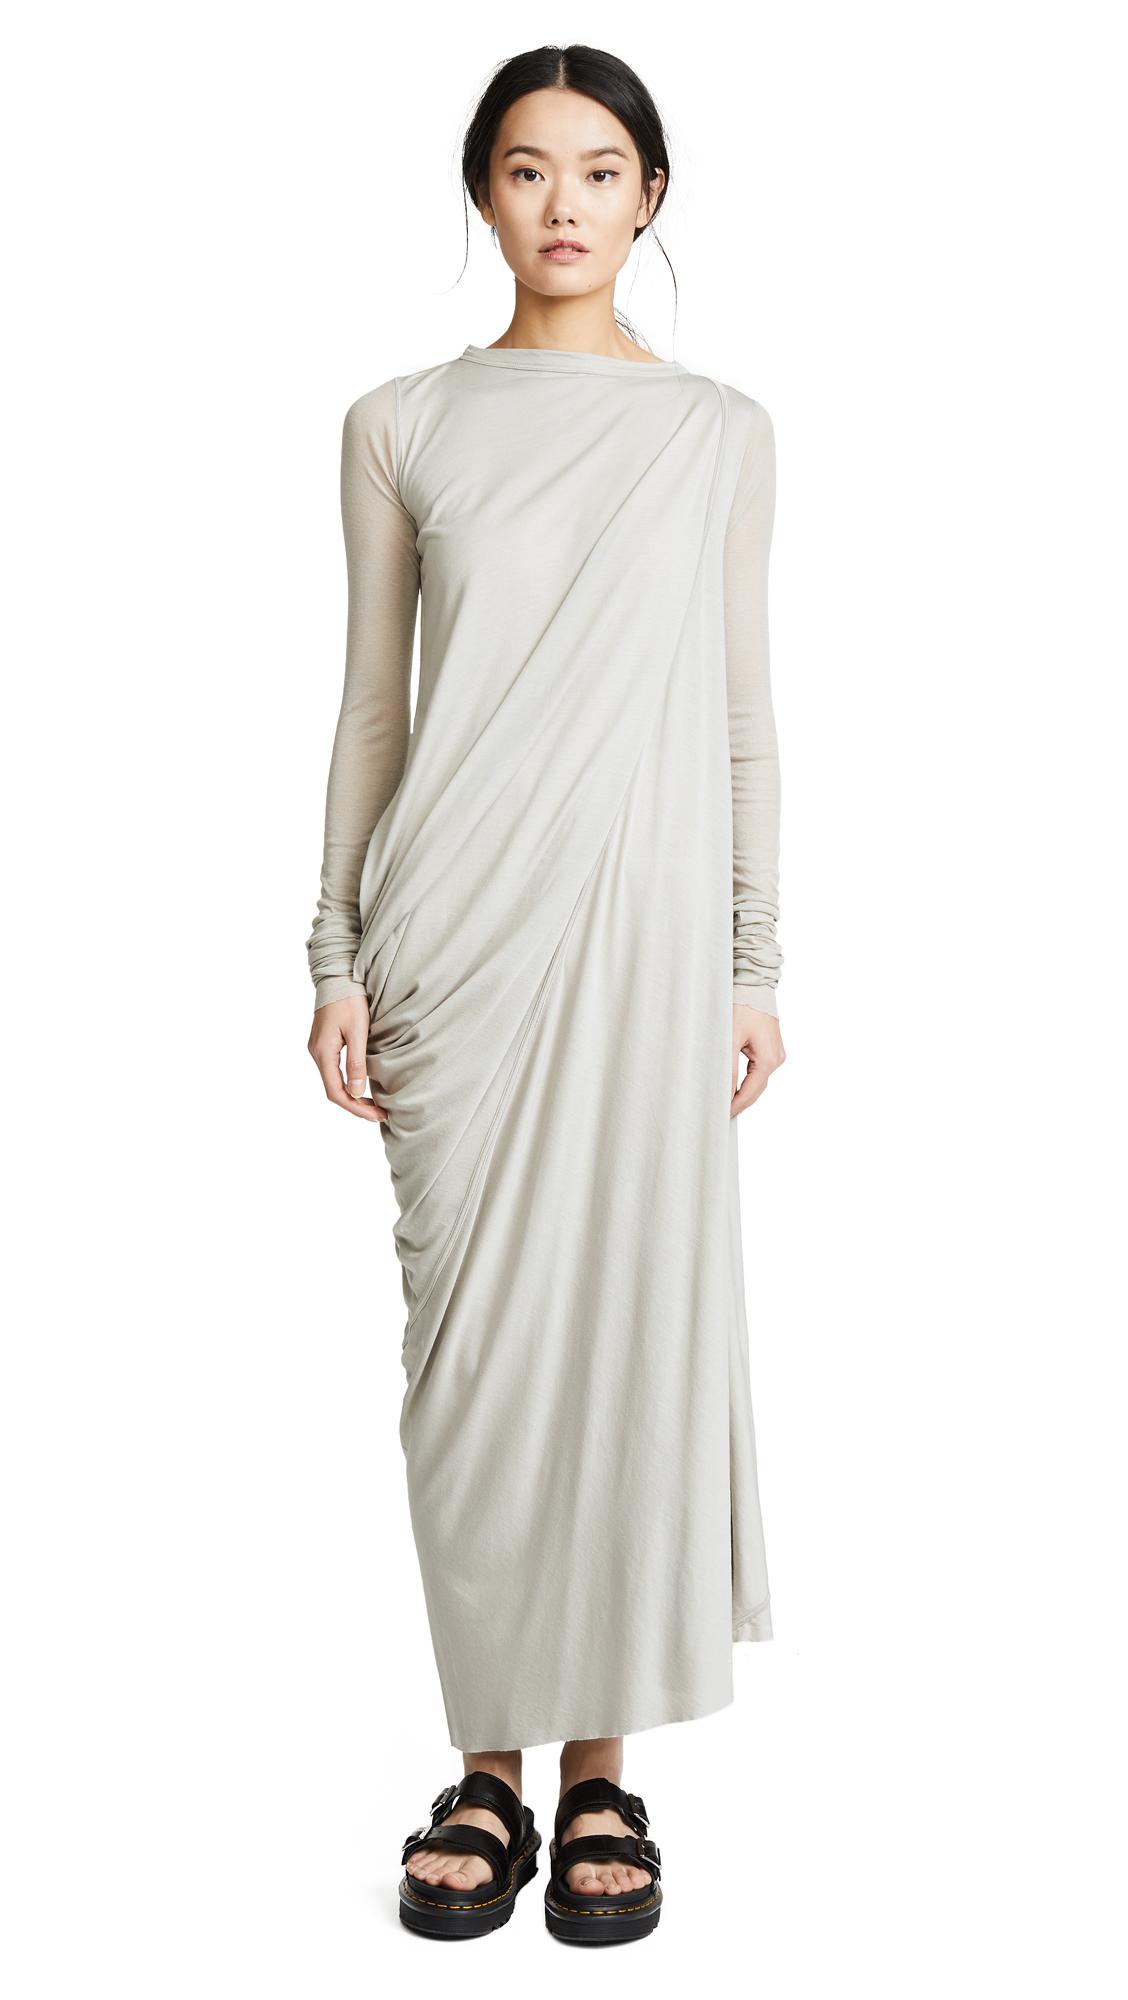 Rick Owens Lilies Long Sleeve Cinched Dress